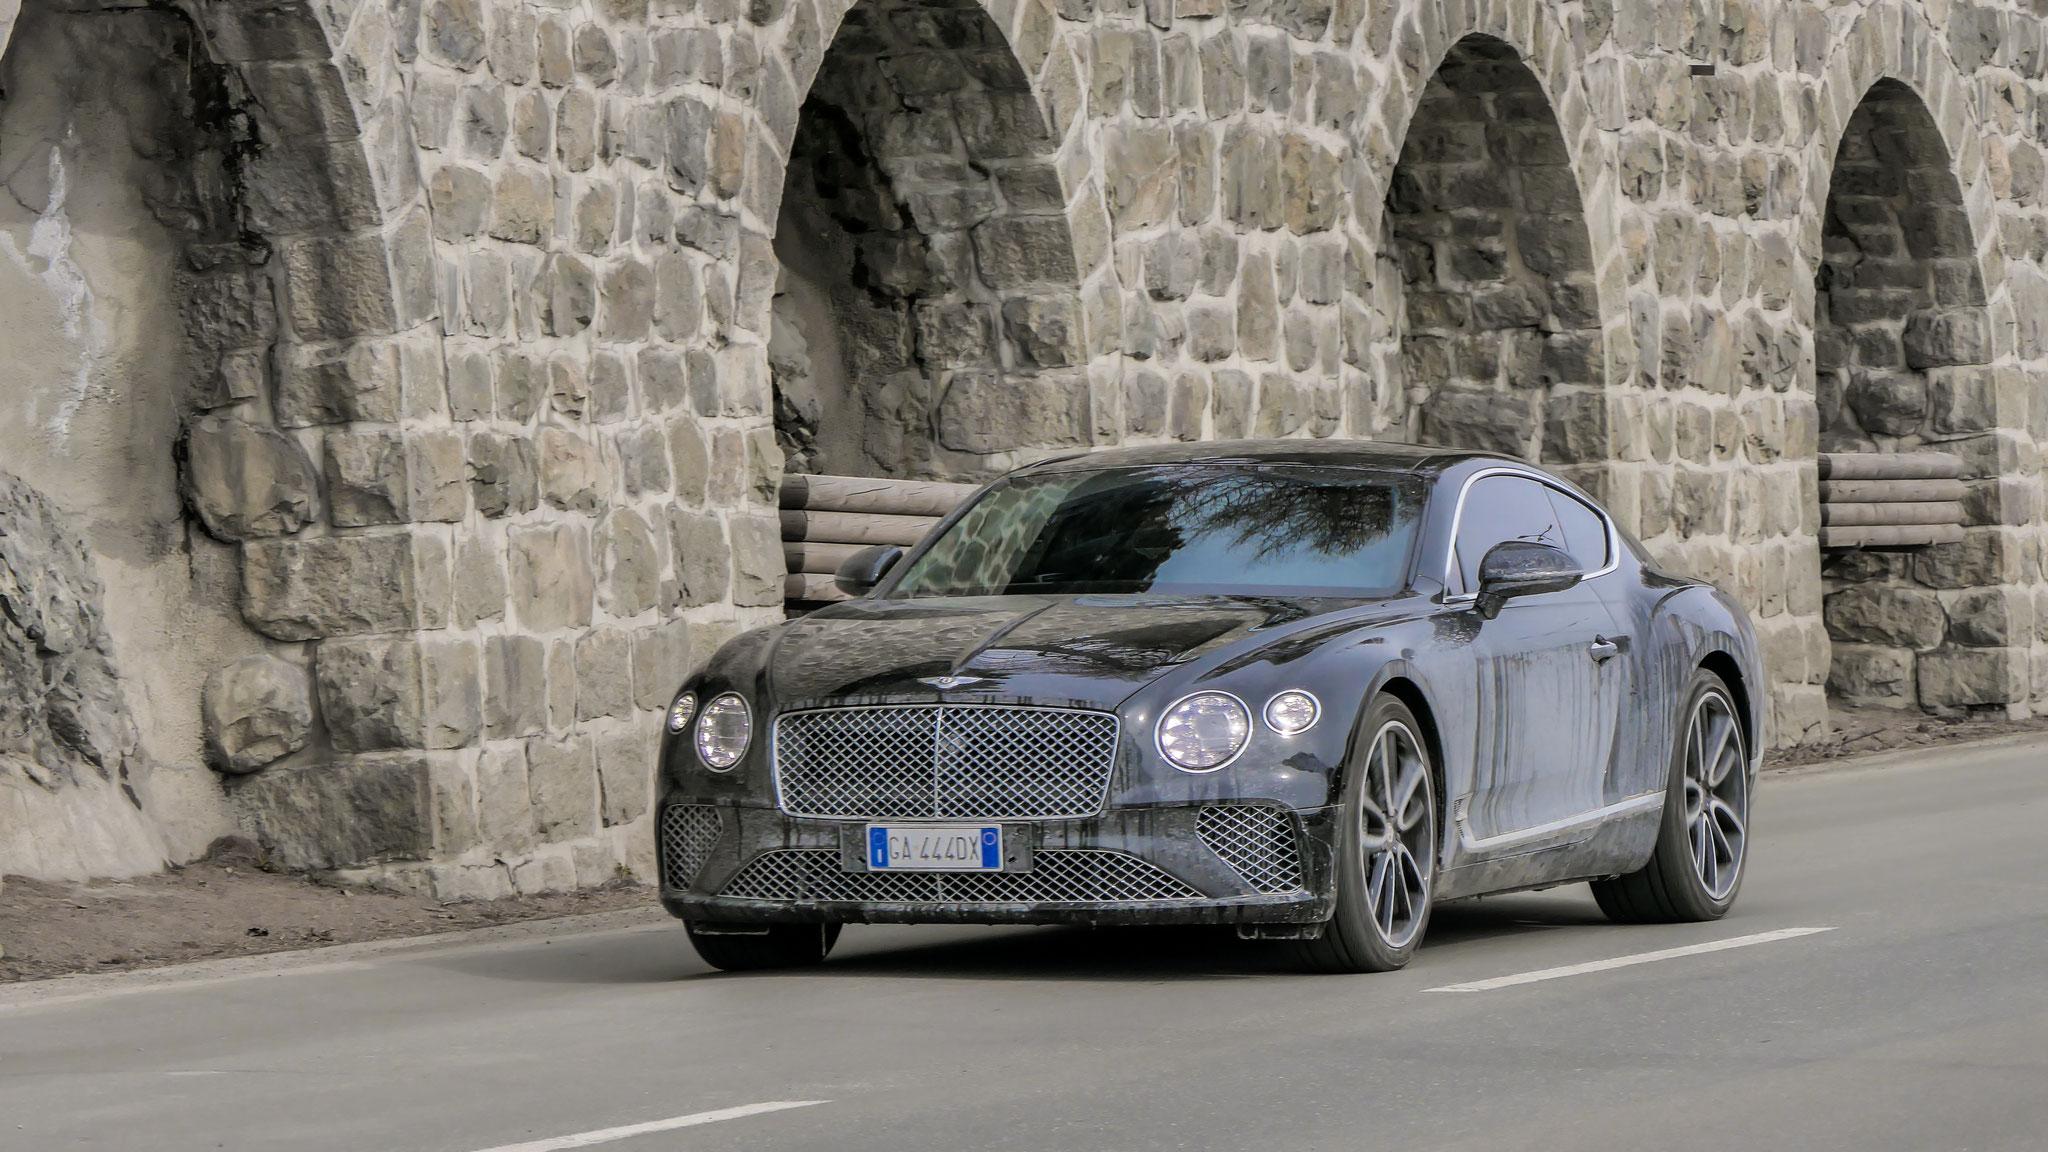 Bentley Continental GT - GA-444-DX (ITA)